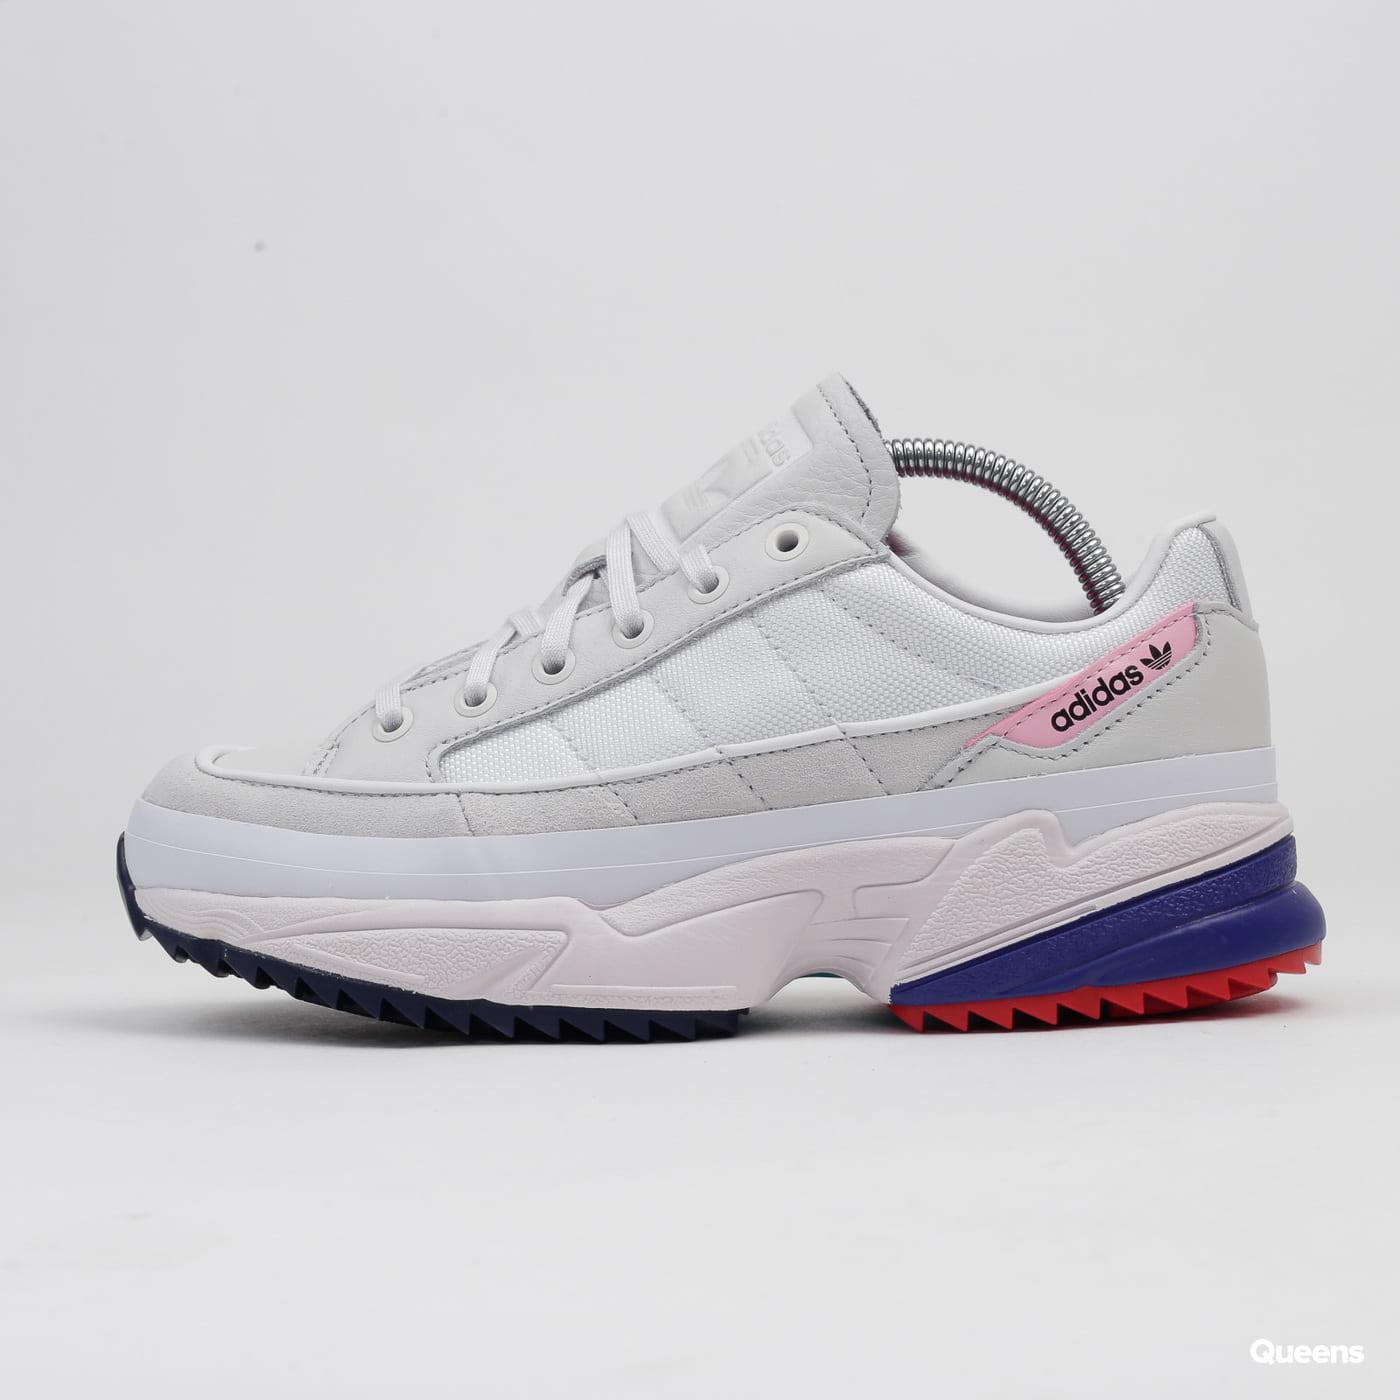 adidas Originals Kiellor W crywht / crywht / orctin